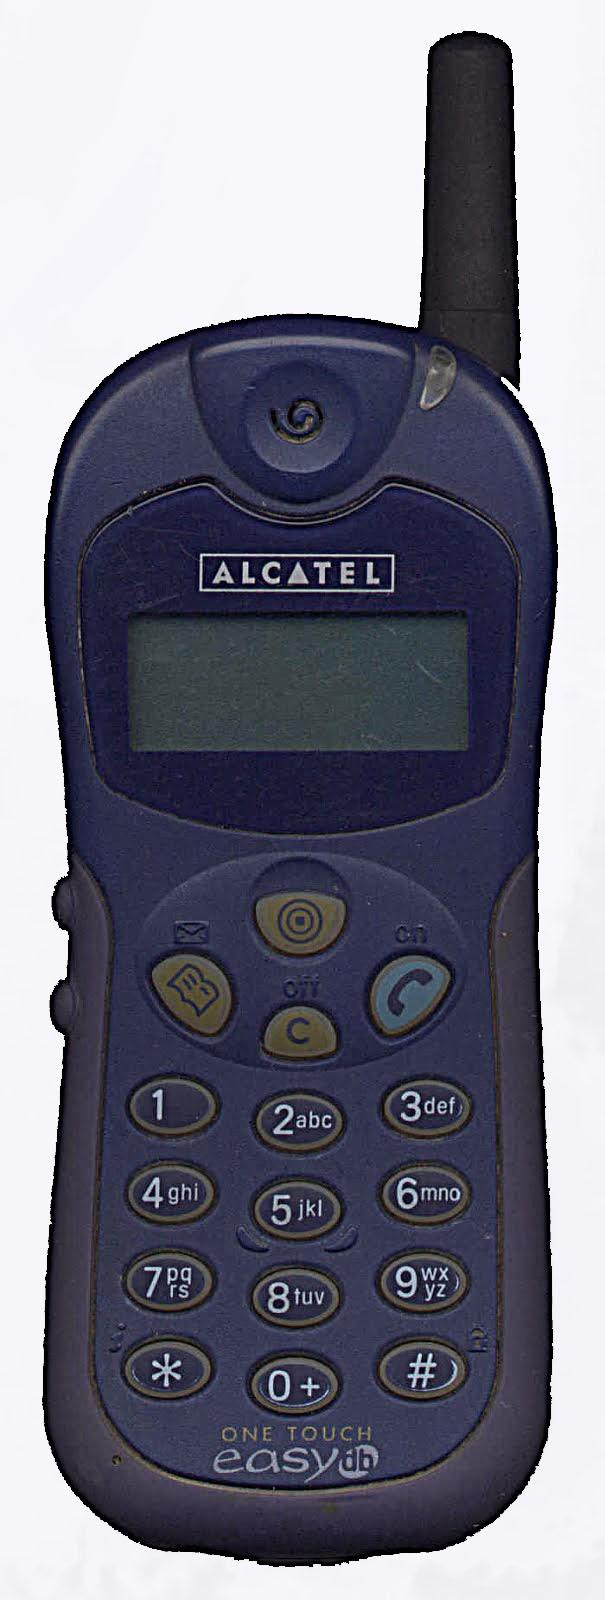 Imagen del mítico Alcatel One Touch Easy